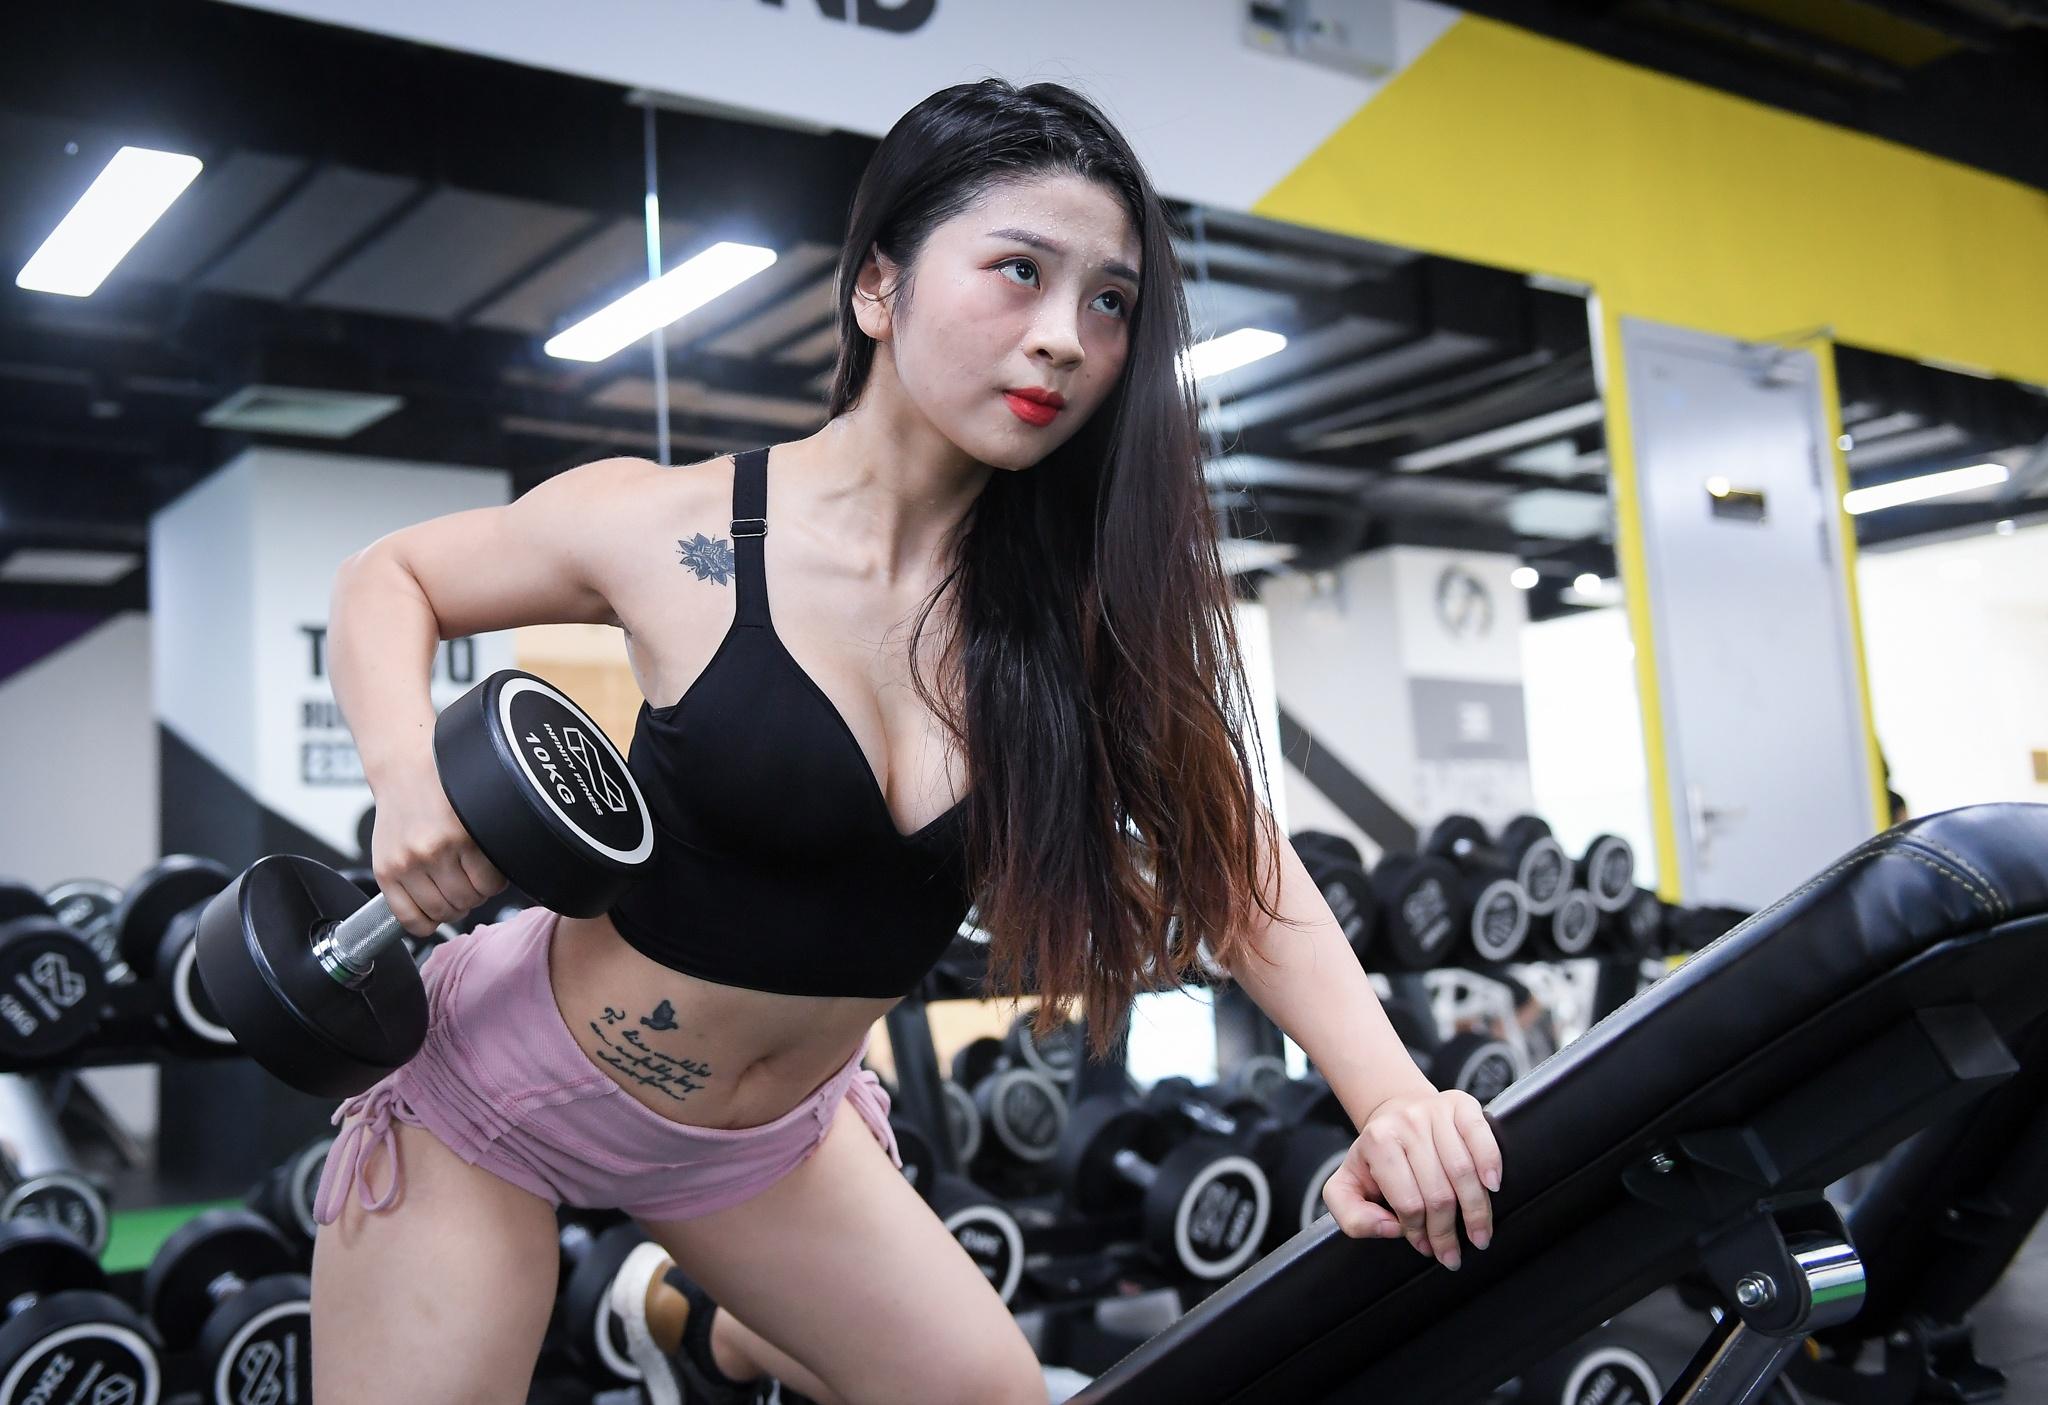 Hot girl mua con so khong ai yeu vi qua manh me hinh anh 20 18_hot_girl_mua_con_zing38.jpg